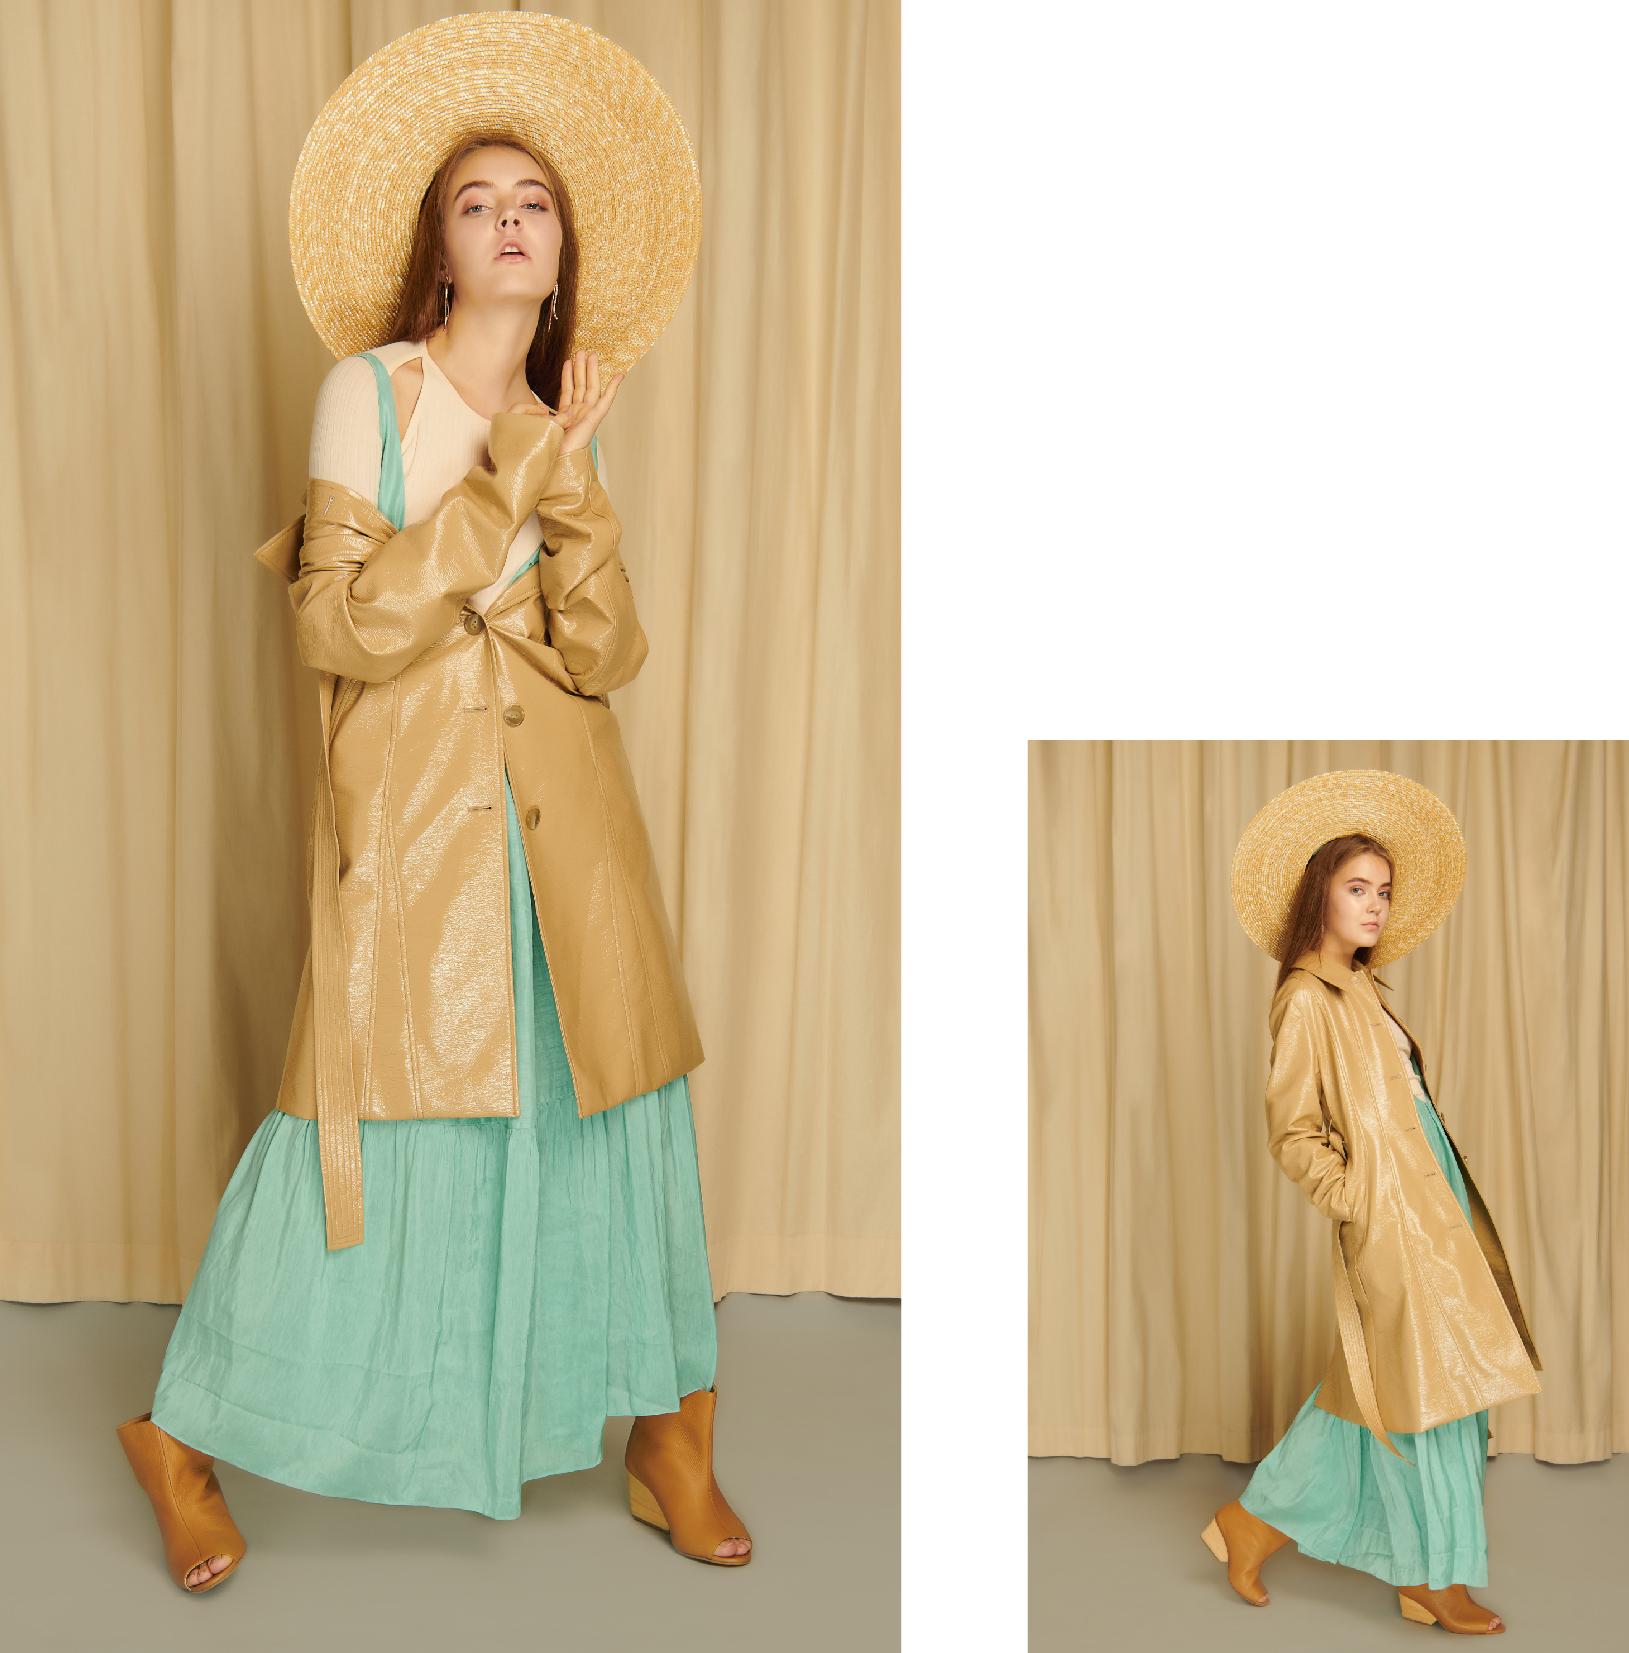 https://s3-ap-southeast-1.amazonaws.com/bchurunway/lookbook/fashion-bold/lookbook_fashion+Bold_edit+photo-05.jpg